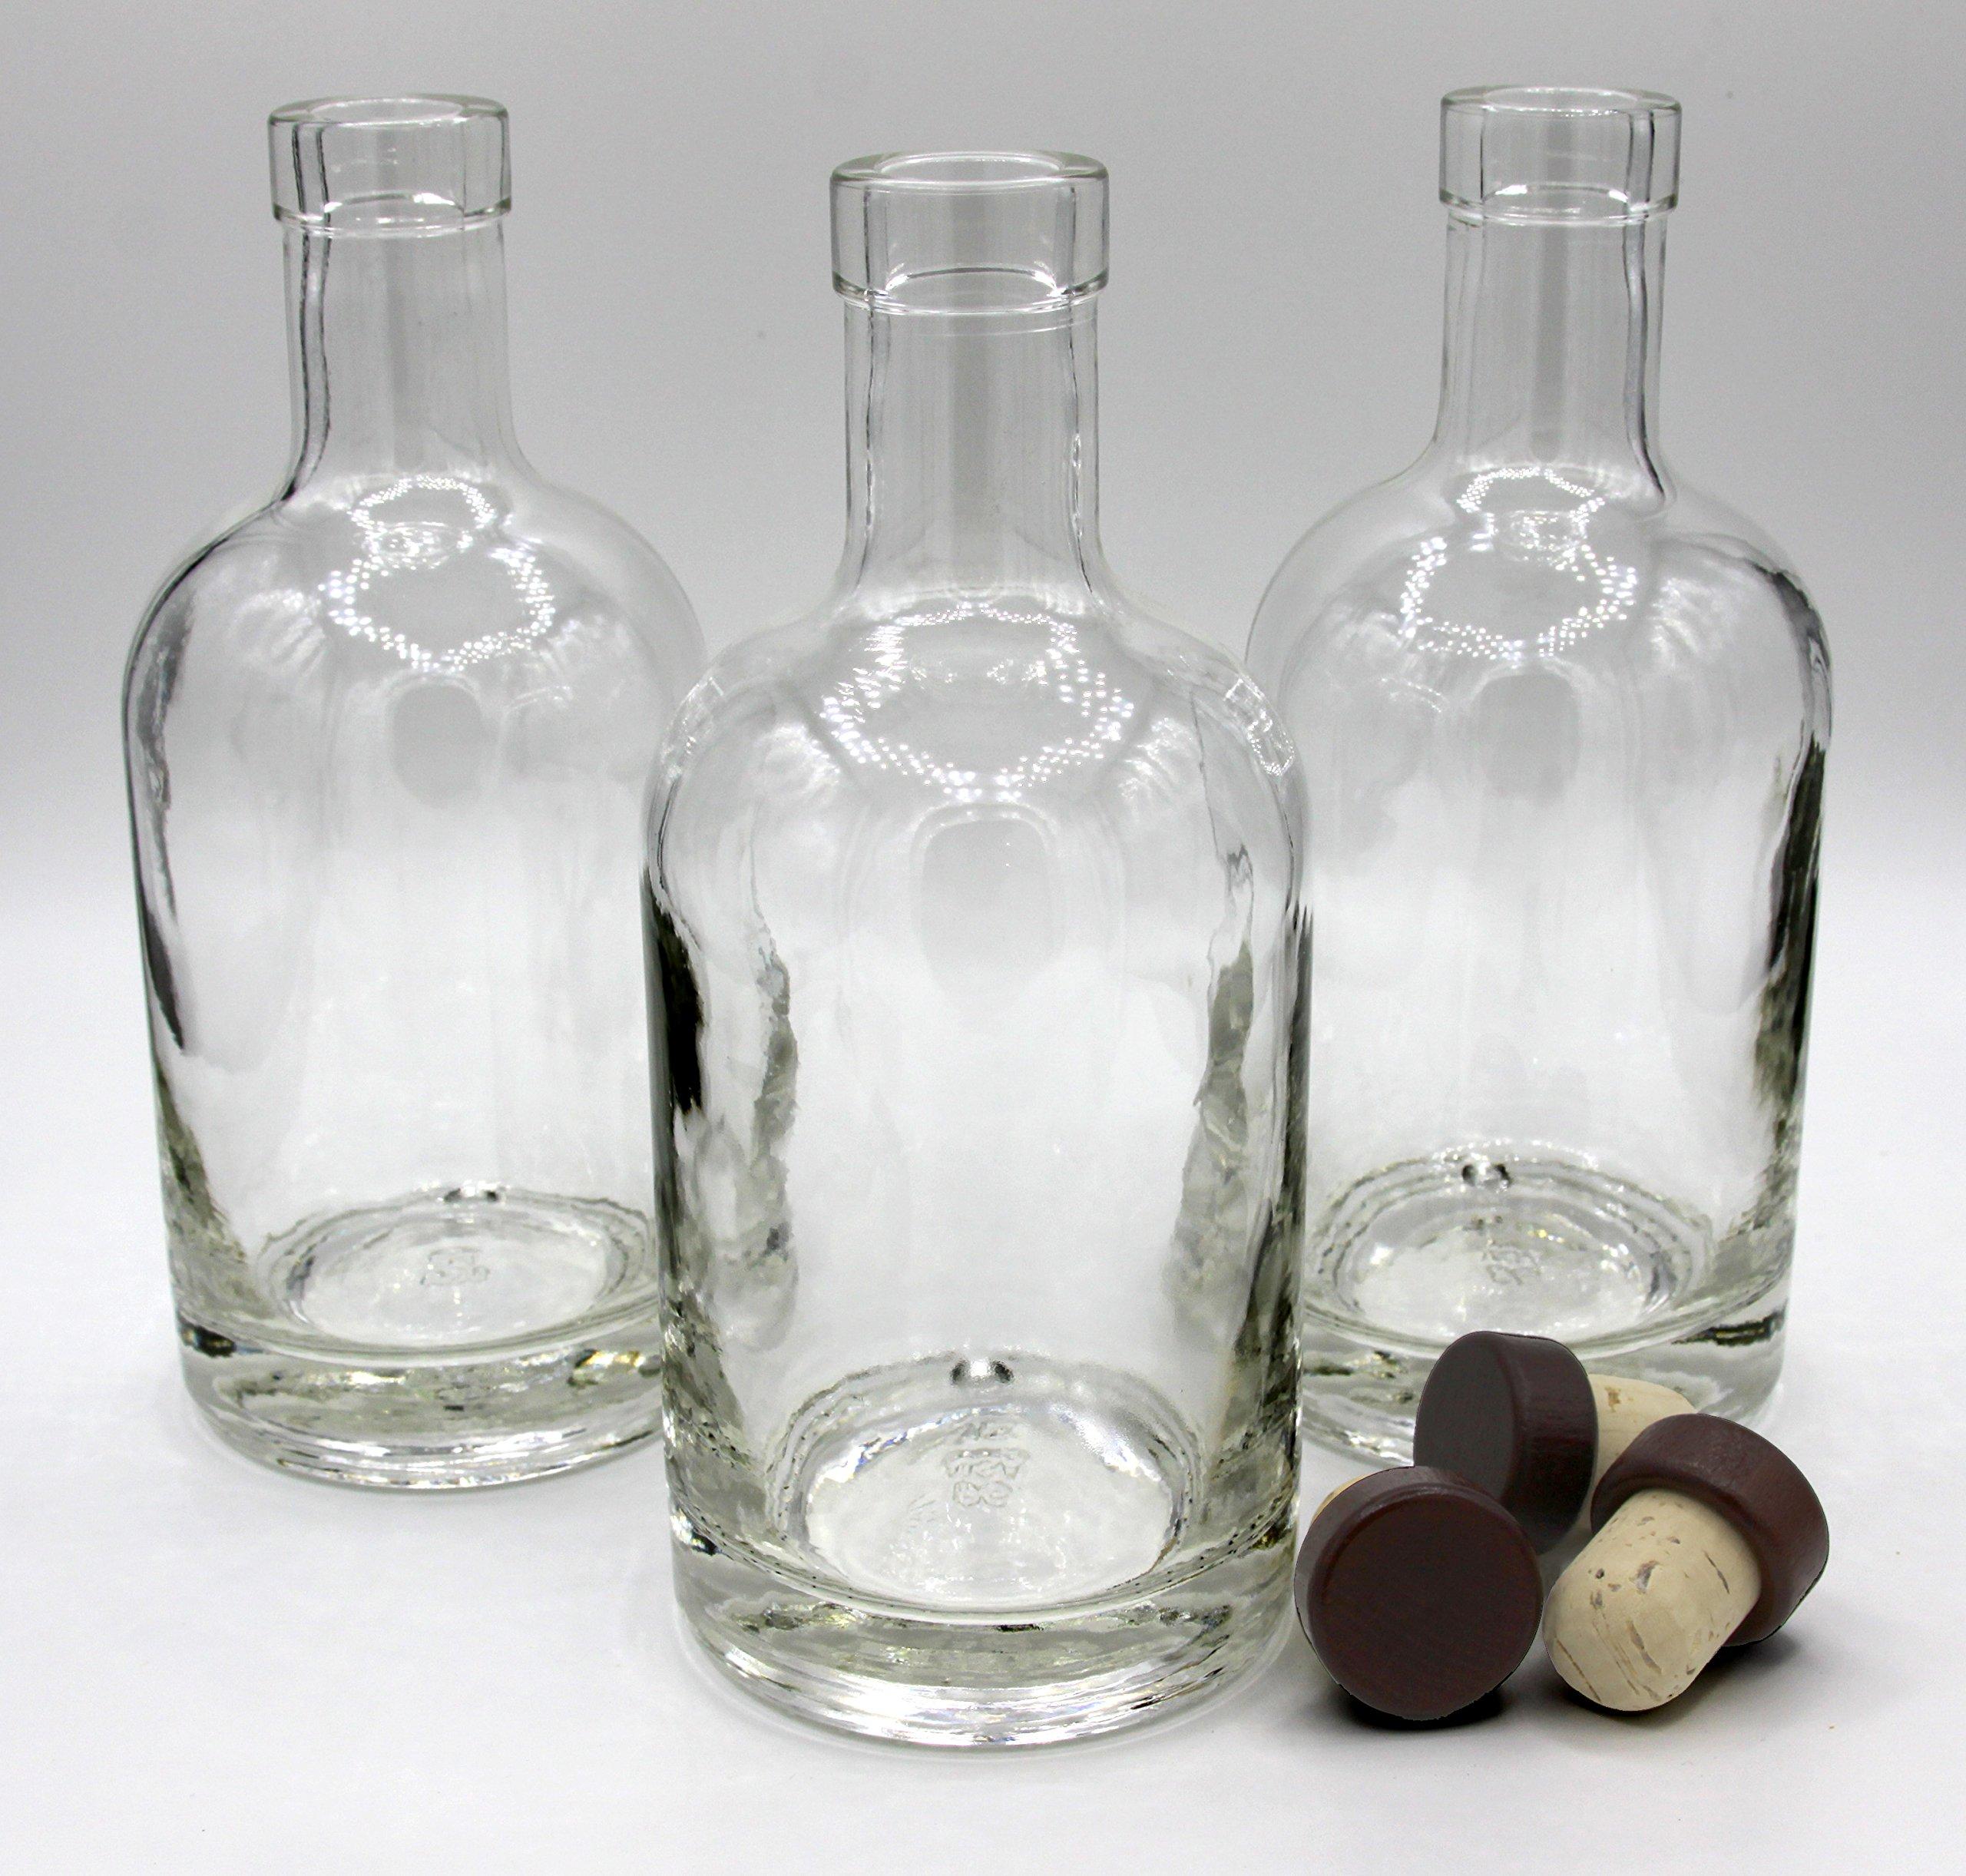 Nordic Bottles - 3 Pack - 375ml (12oz.) Bottles with Dark Wood Bar Top Cork Caps